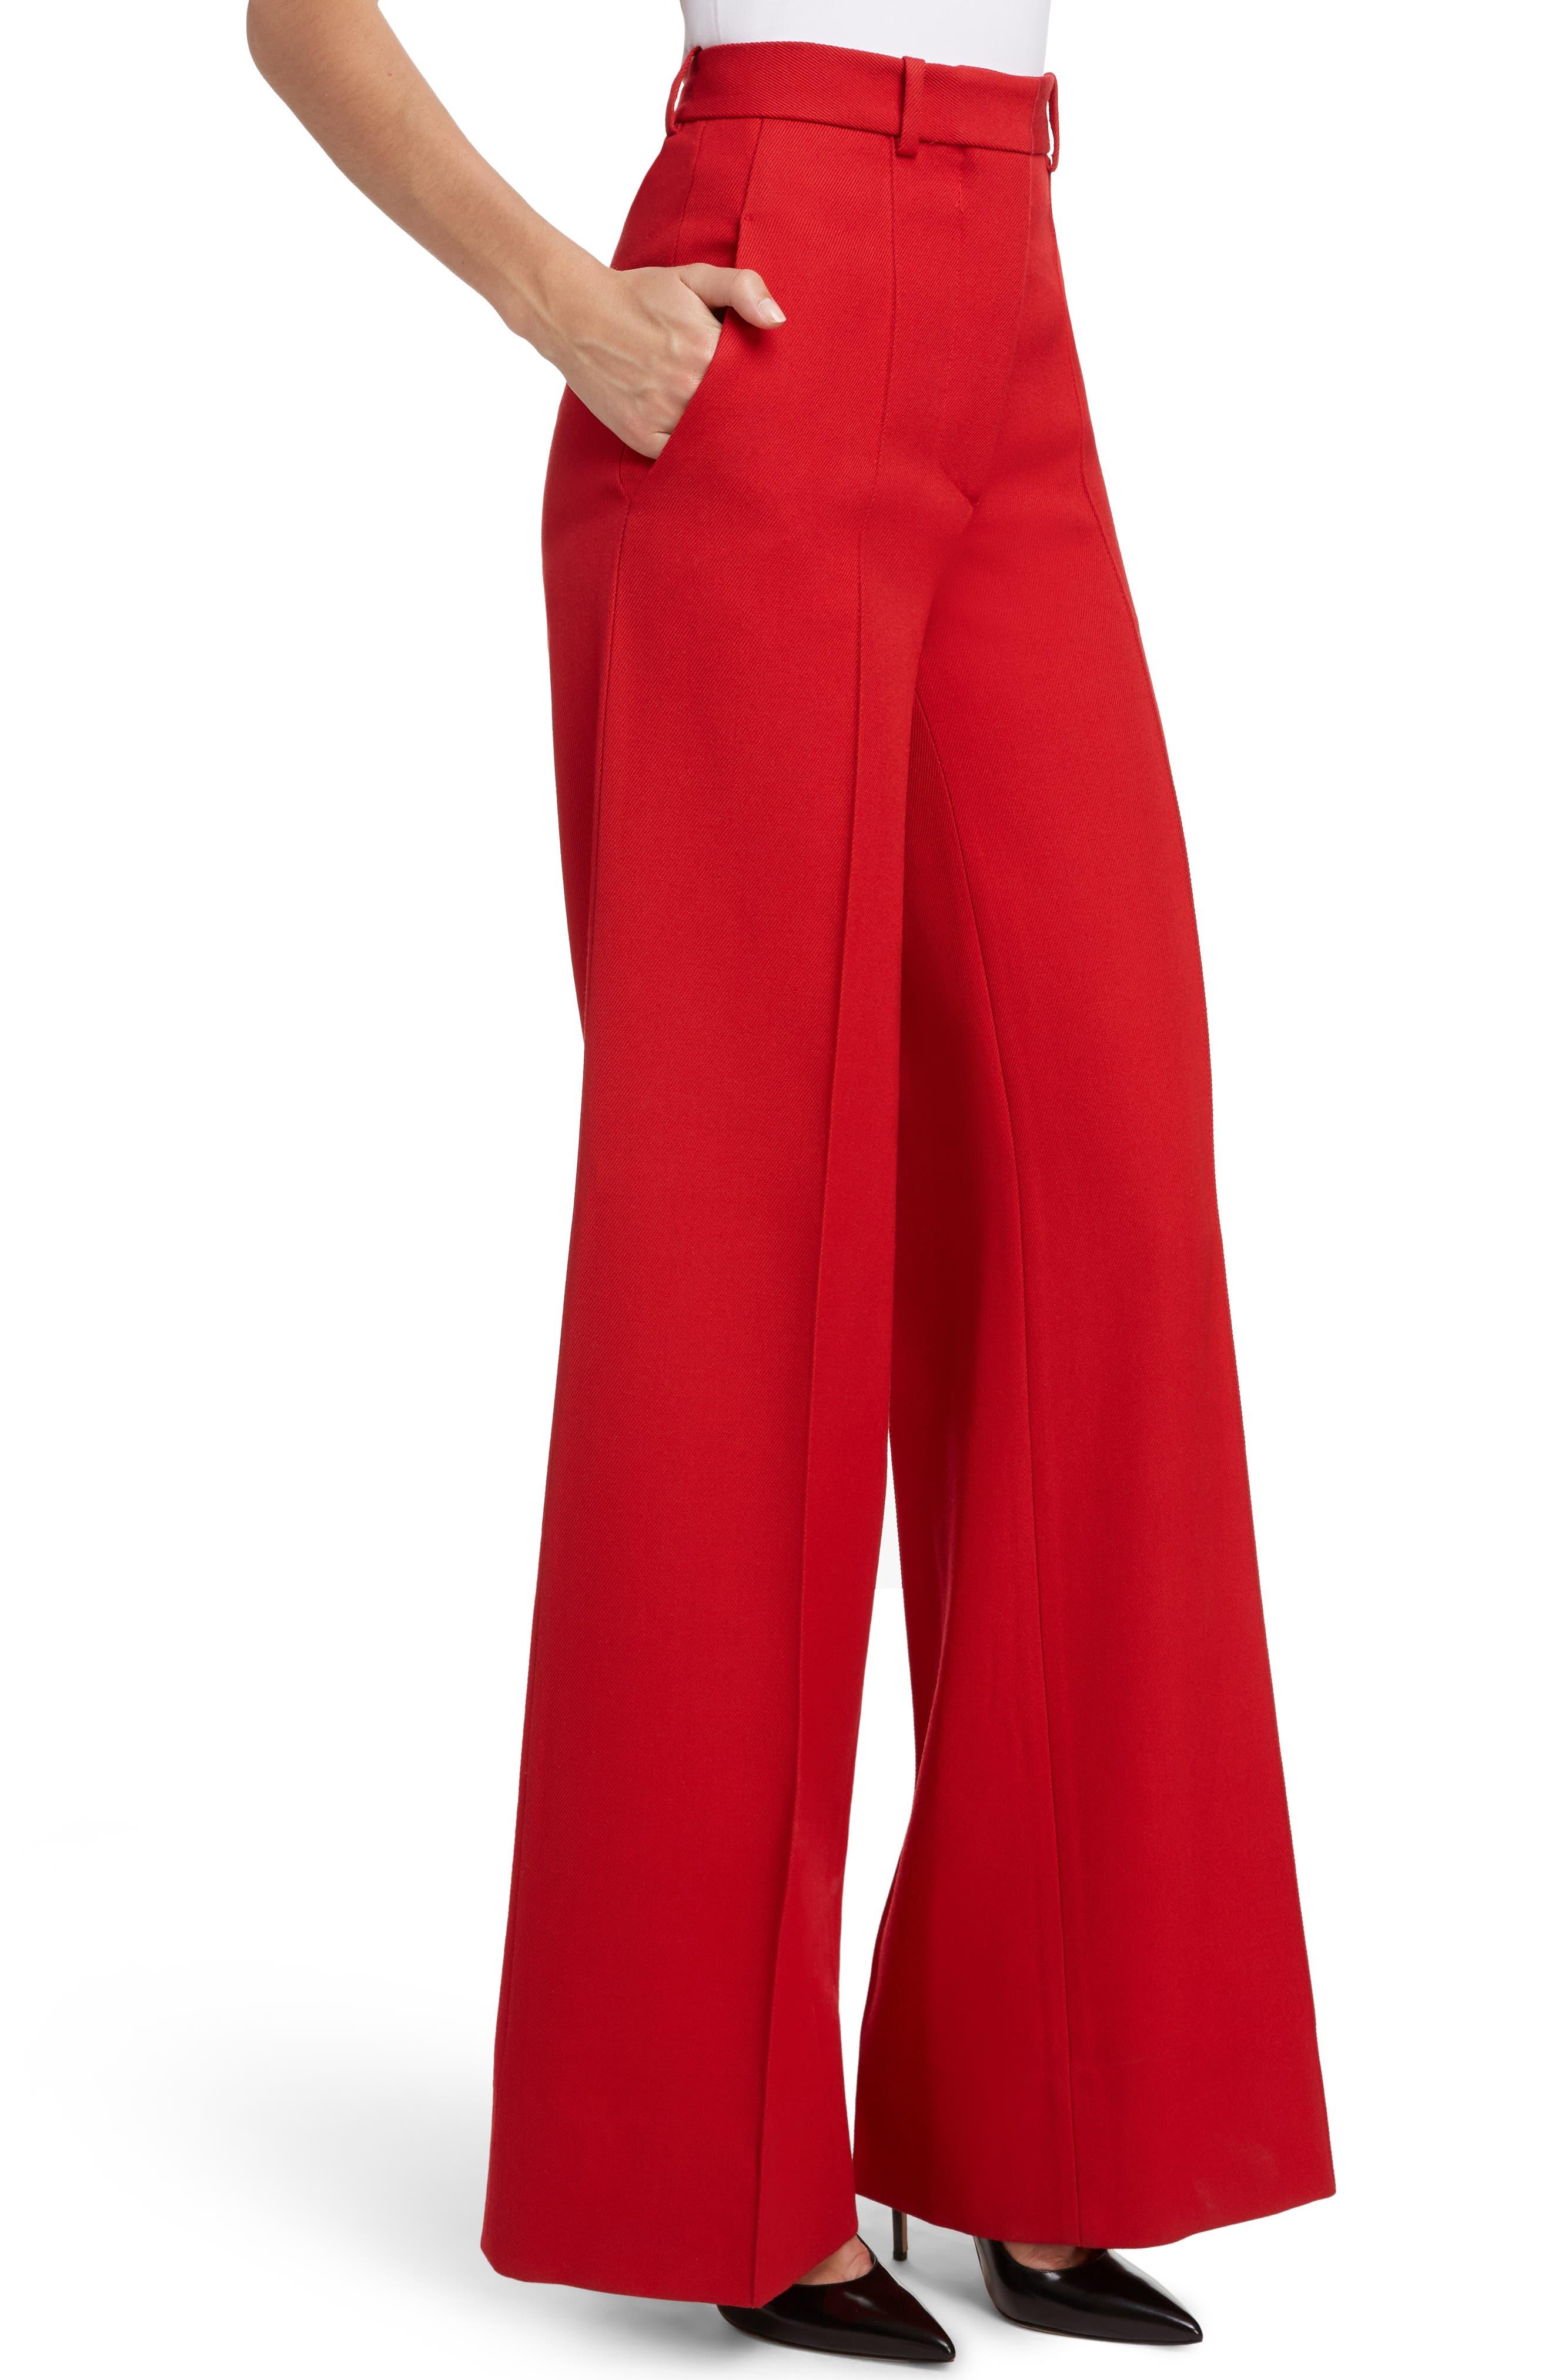 VICTORIA BECKHAM, High Waist Wool Pants, Alternate thumbnail 4, color, RED